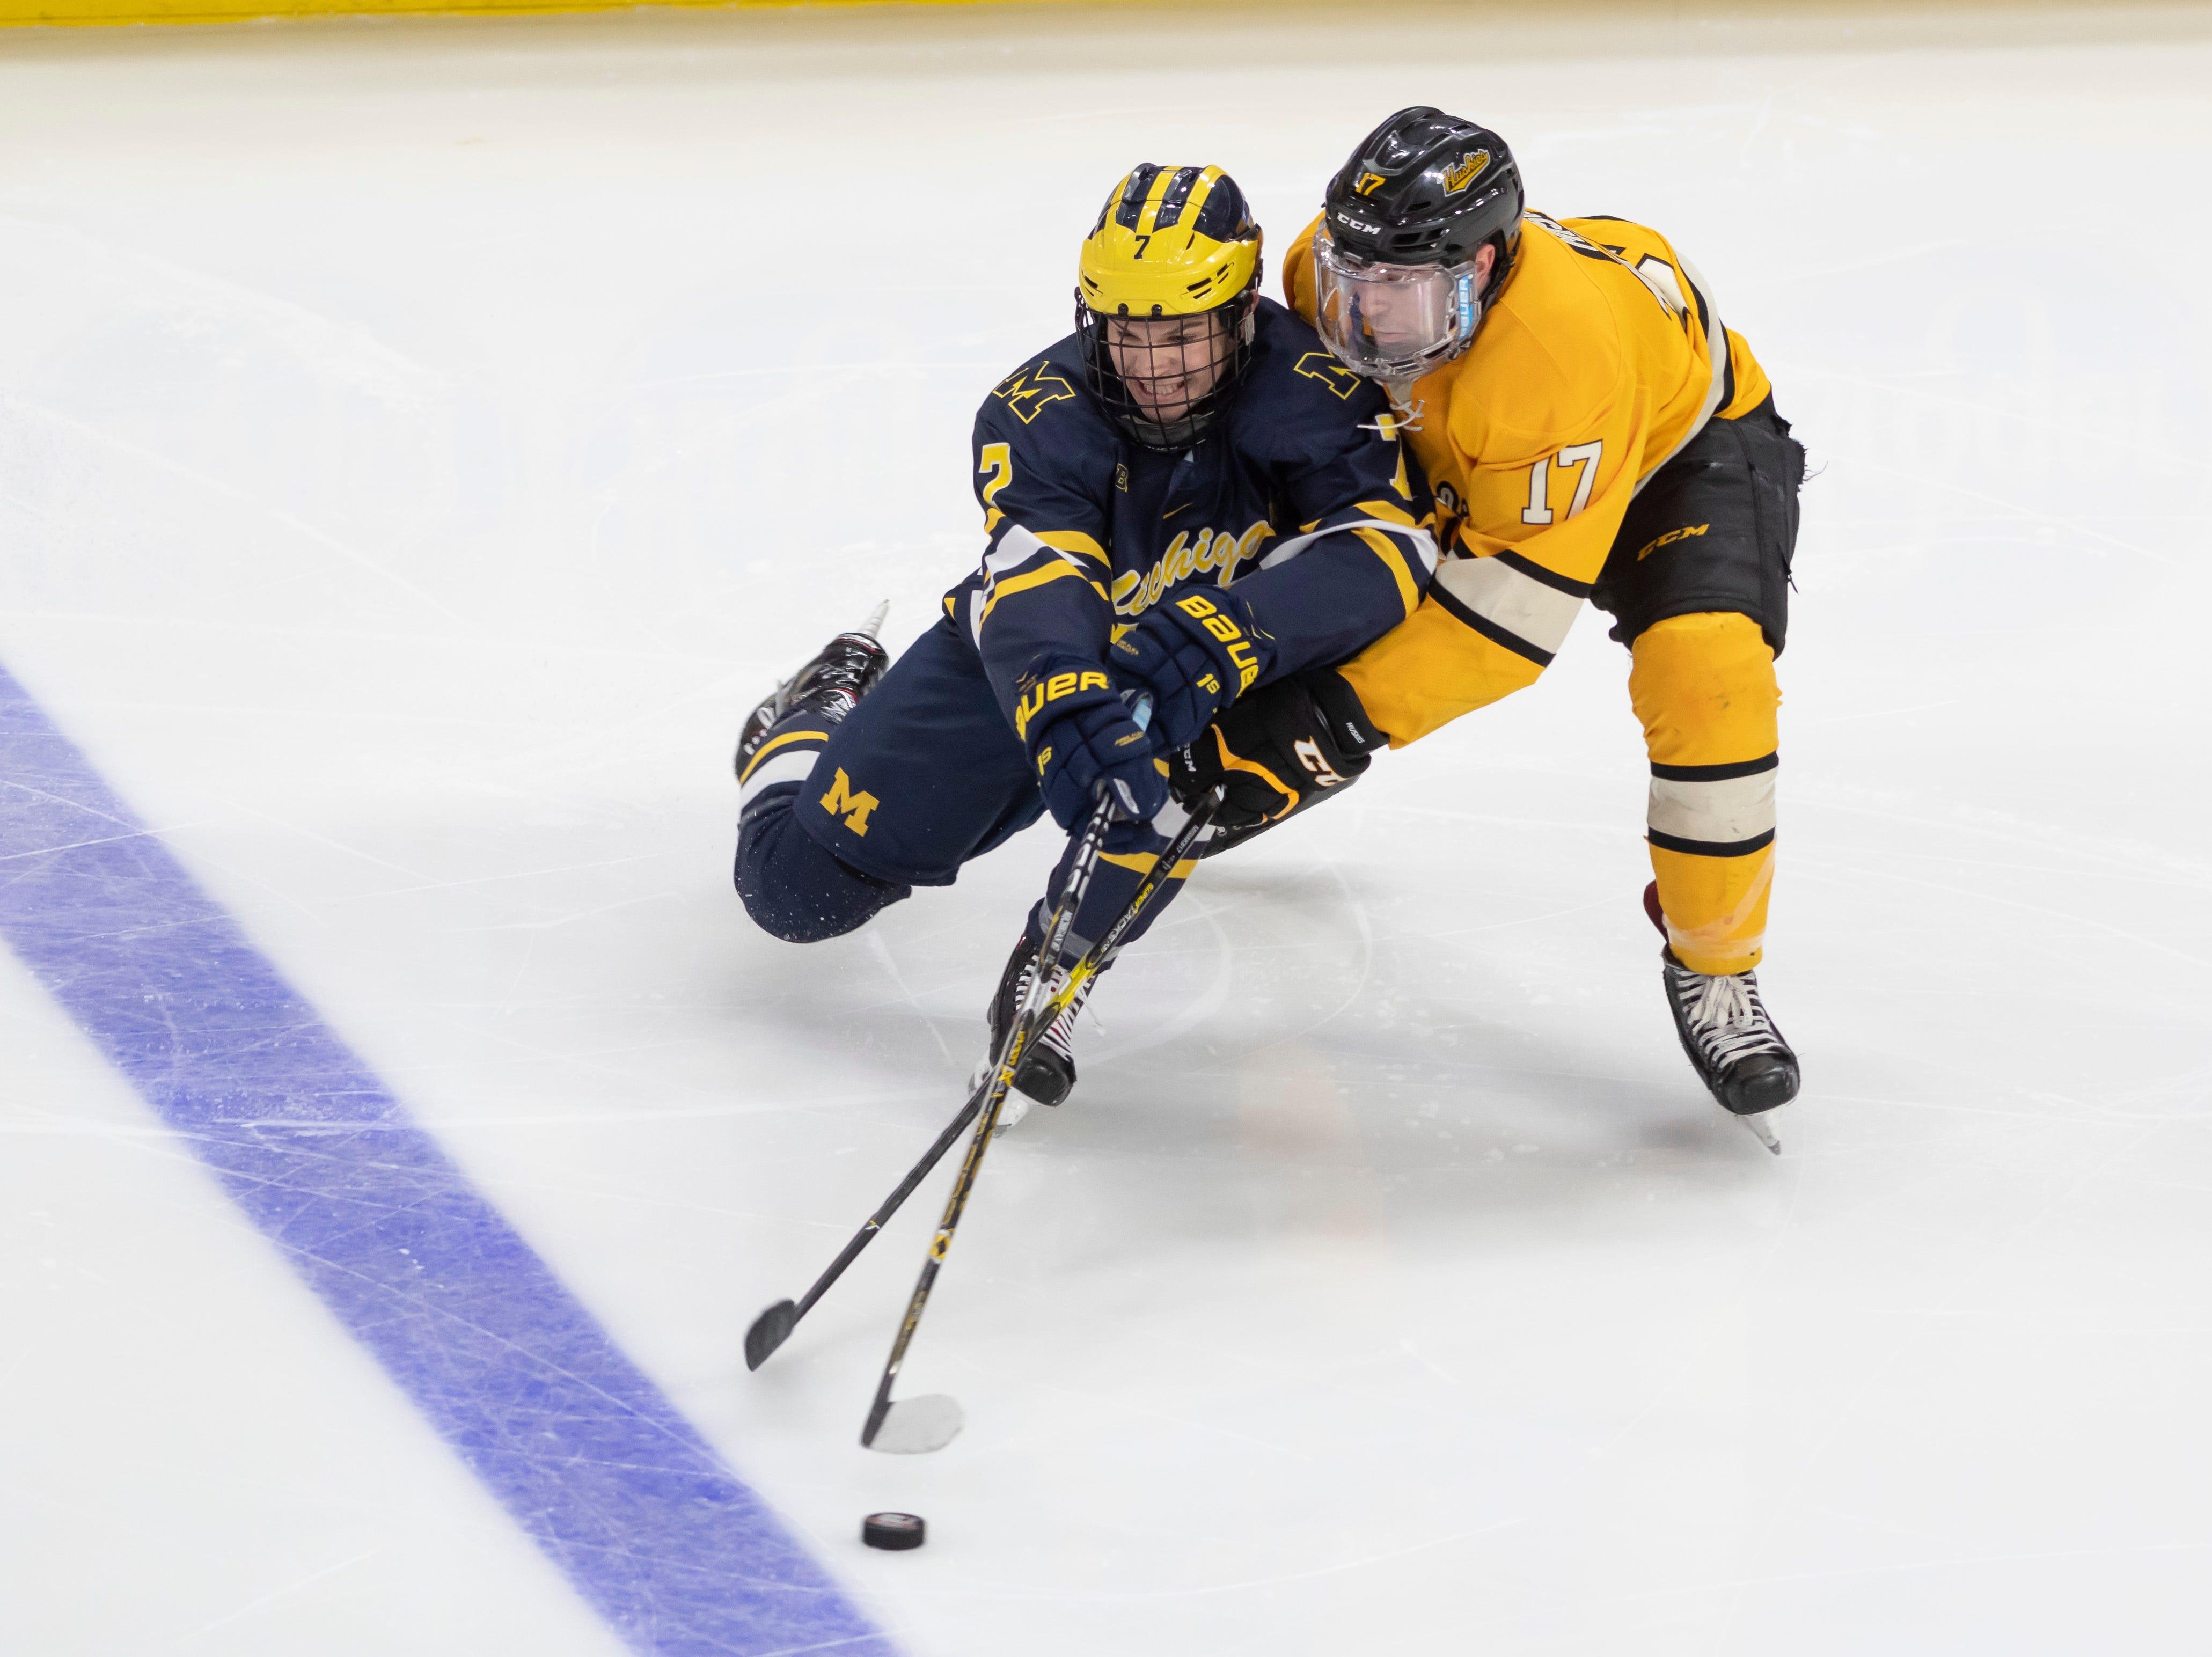 Michigan defenseman Nick Blankenburg and Michigan Tech forward Justin Misiak battle for the puck in the third period.